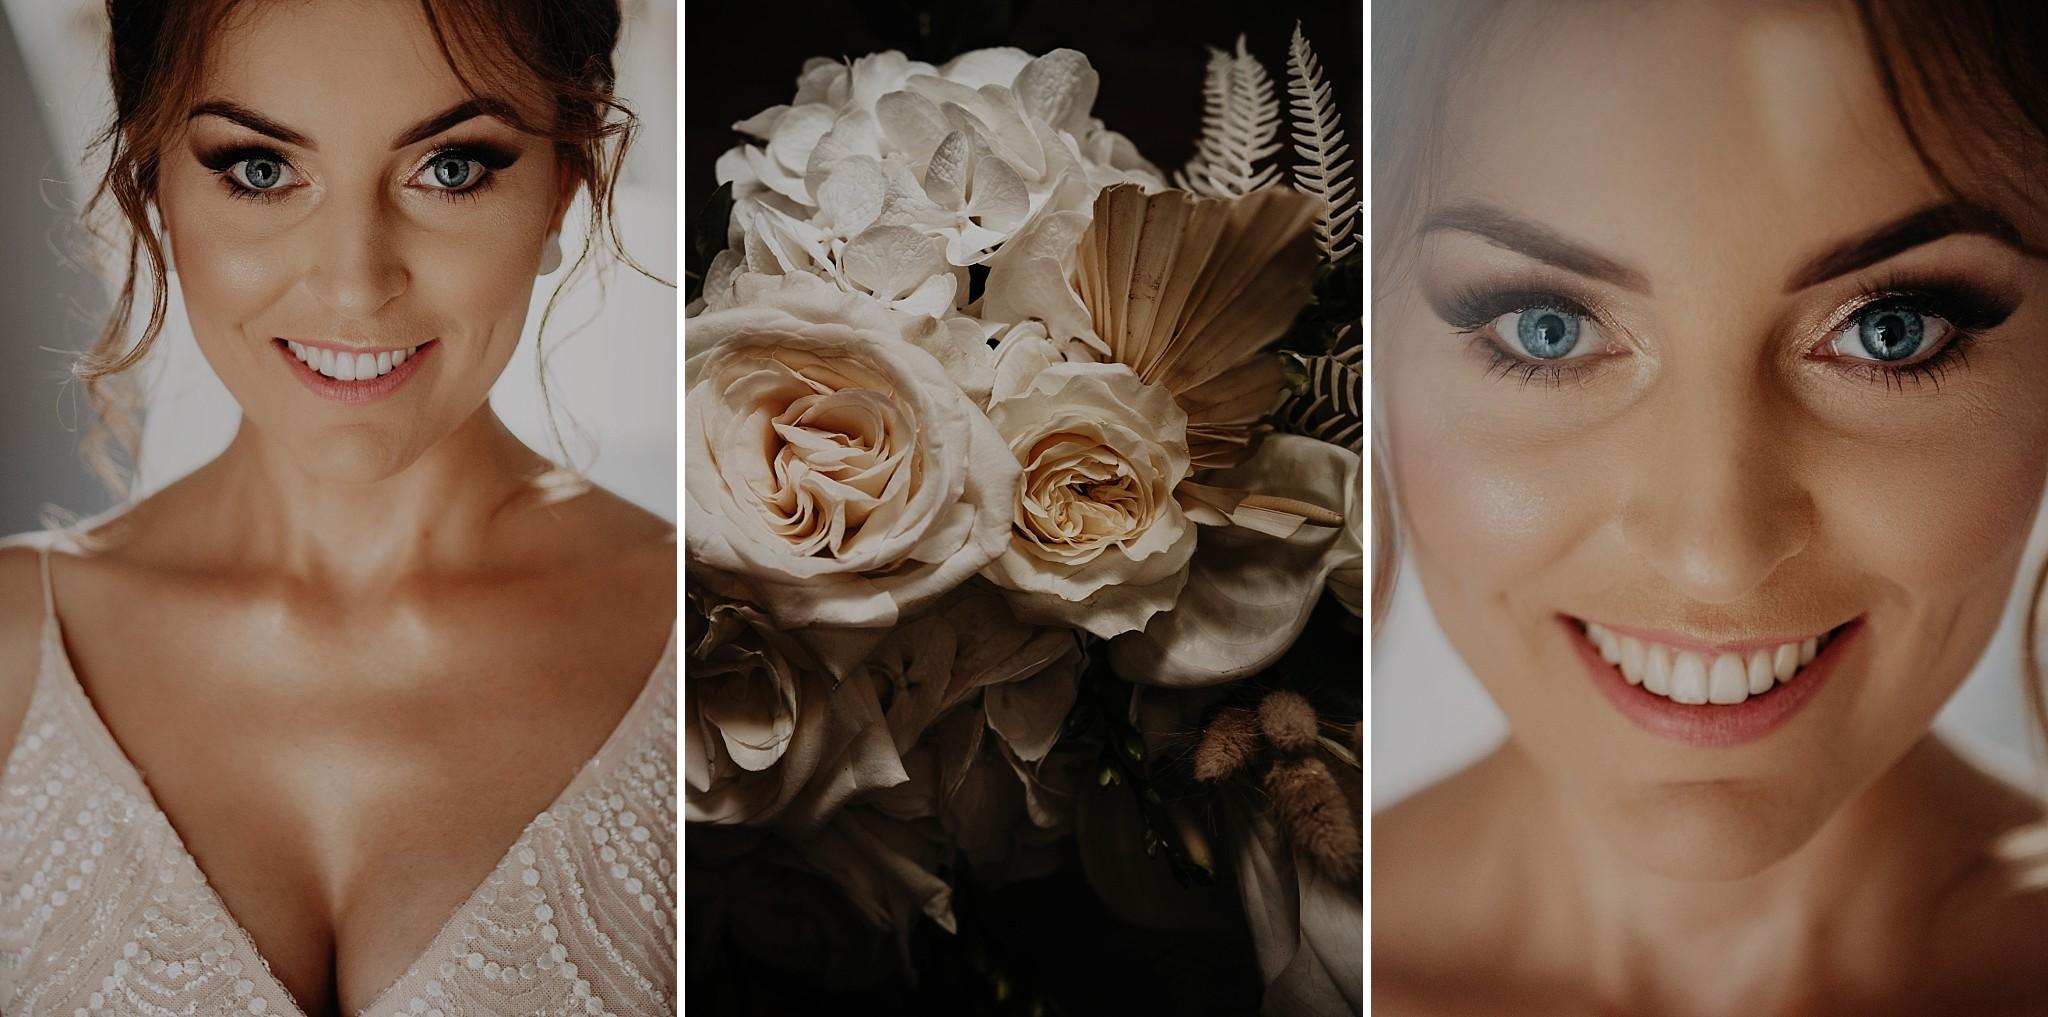 fotograf poznan wesele dobra truskawka piekne wesele pod poznaniem wesele w dobrej truskawce piekna para mloda slub marzen slub koronawirus slub listopad wesele koronawirus 086